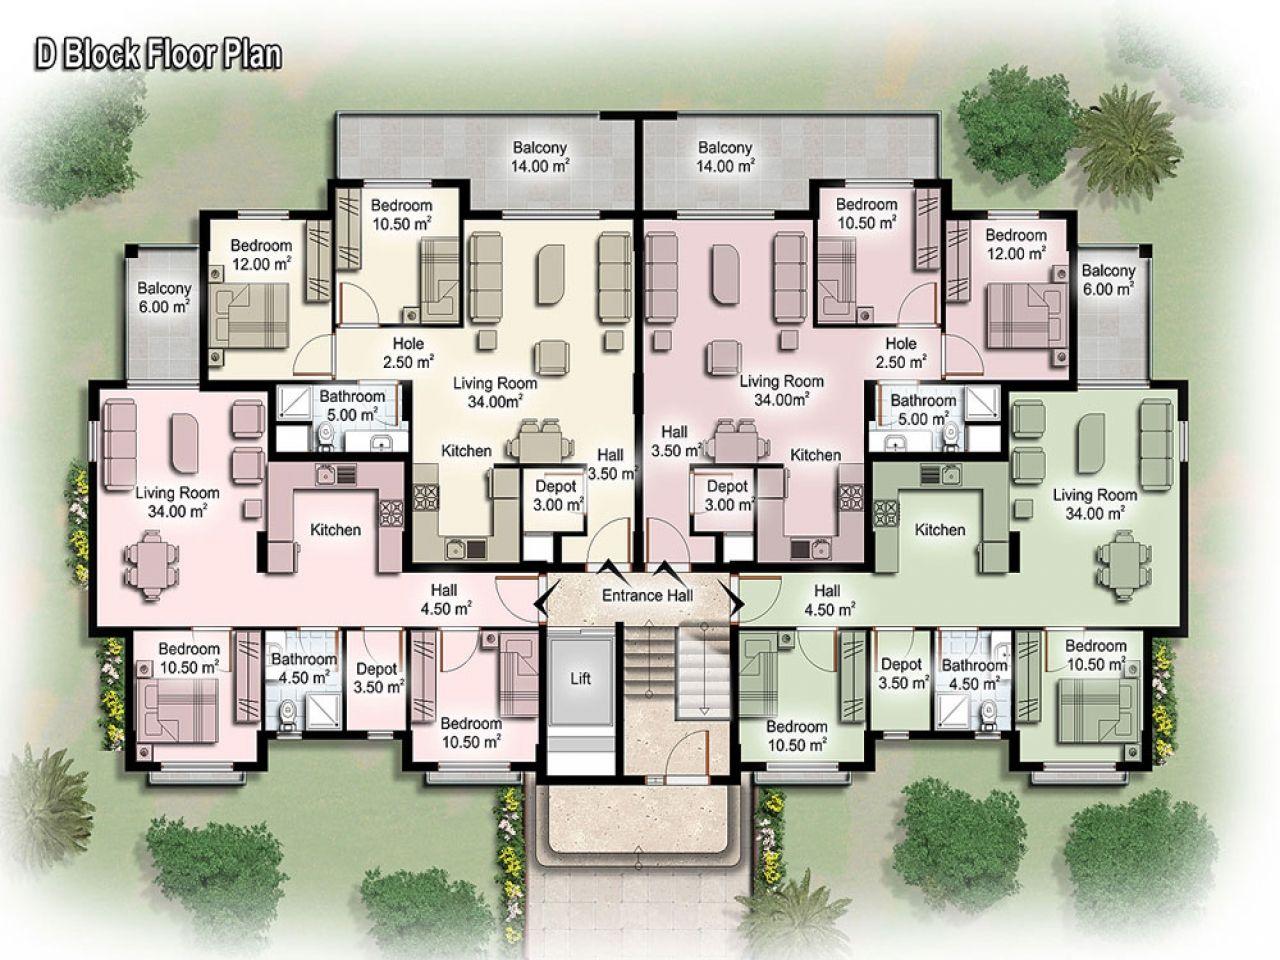 Home Design Software Building Blocks Free Download Modern Floor Plans Apartment Floor Plans Apartment Building